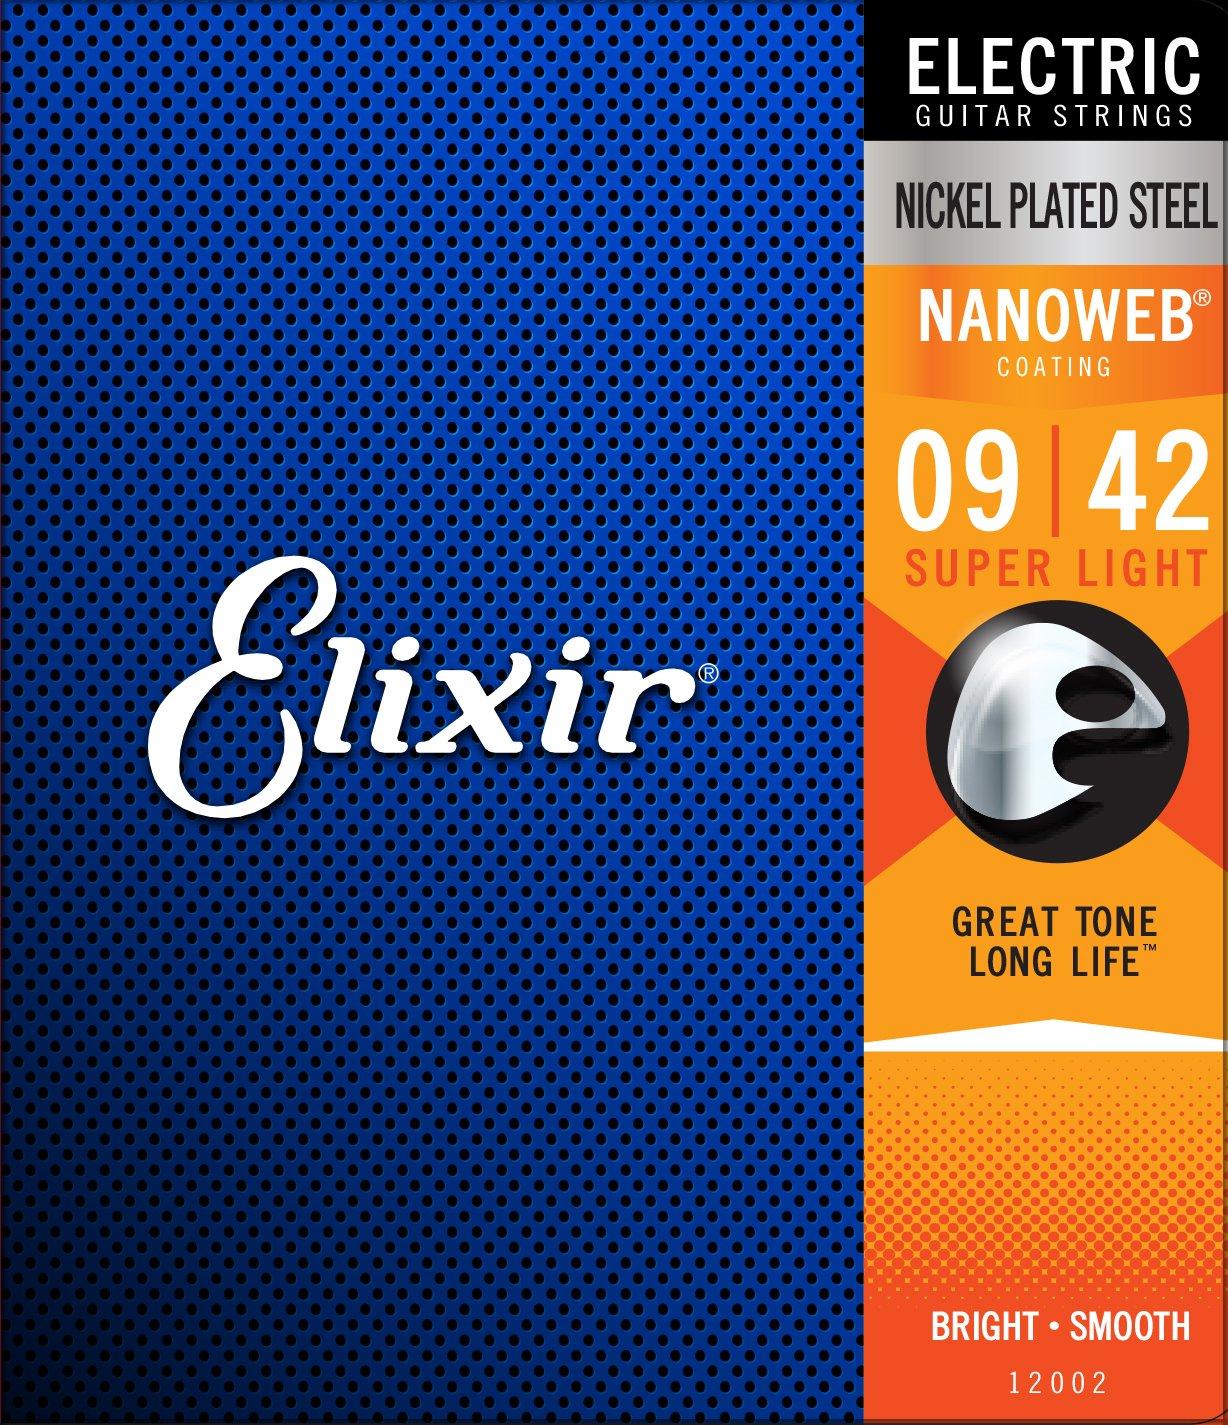 Elixir Nickel Plated Steel 12002 Electric Guitar Strings, NANOWEB, Super Light, 9-42